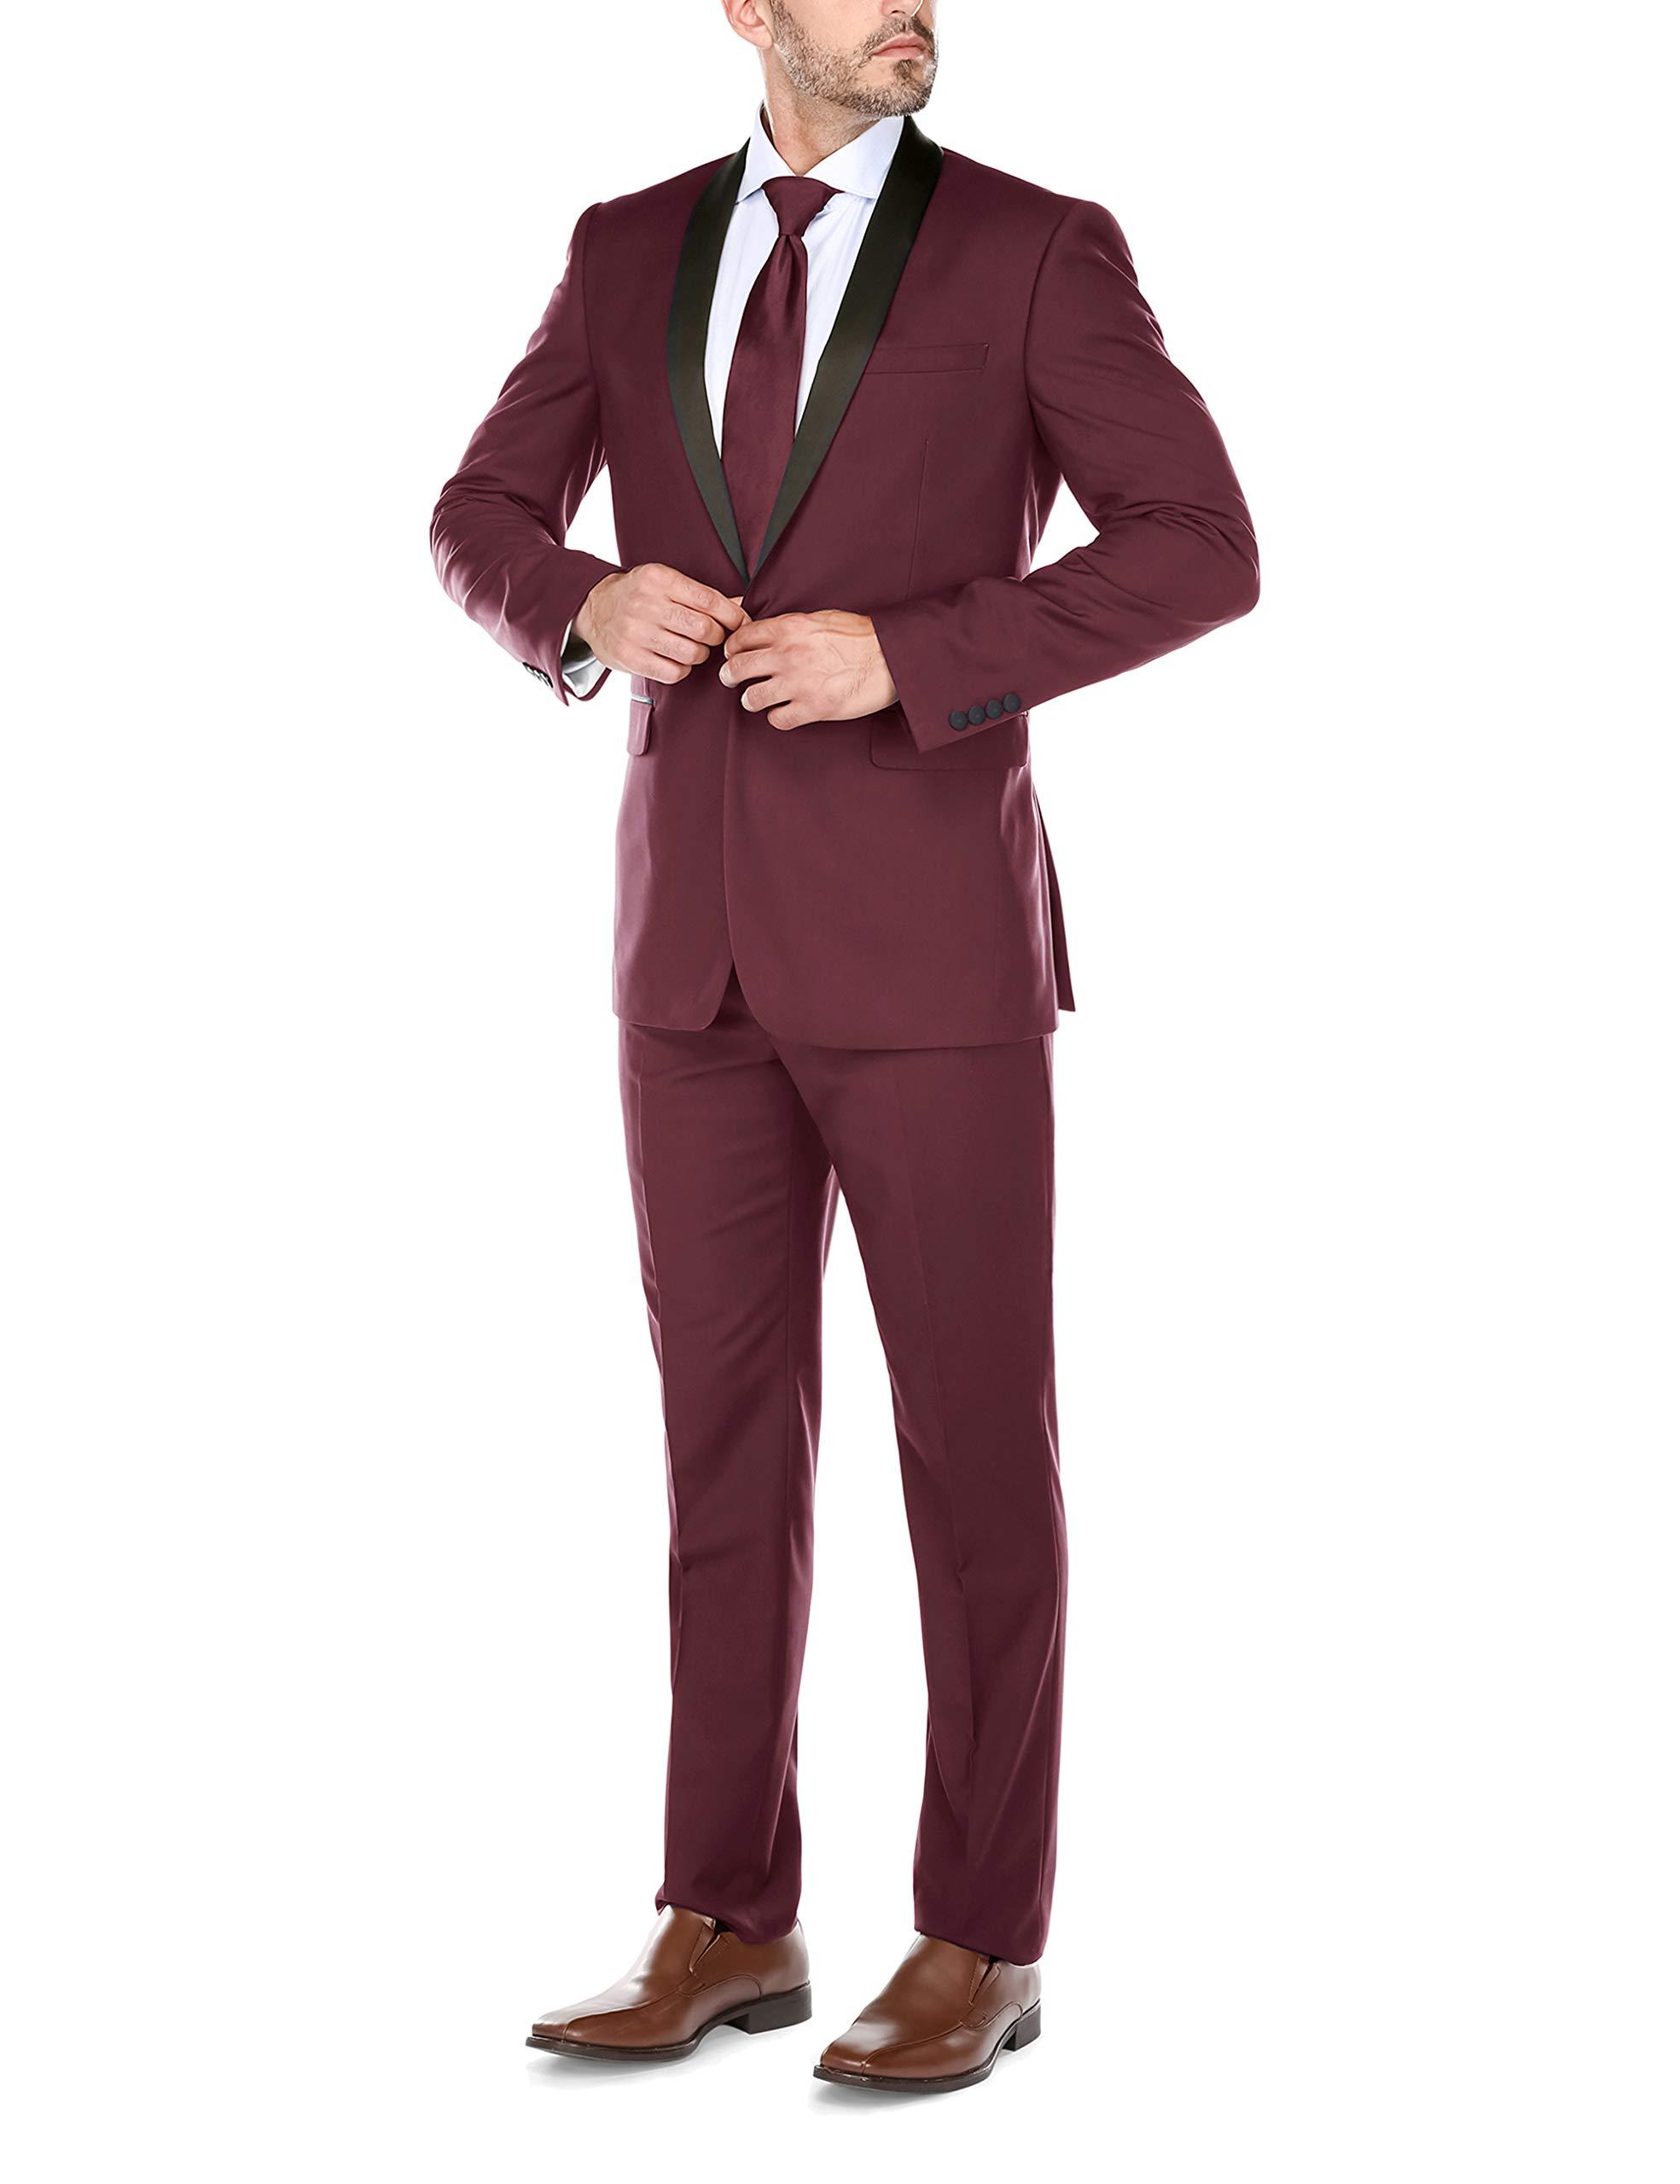 CHAMA Men's Single Breasted Shawl Collar Tuxedo Slim Fit Suit (44 Regular /38 Waist, Burgundy) by CHAMA